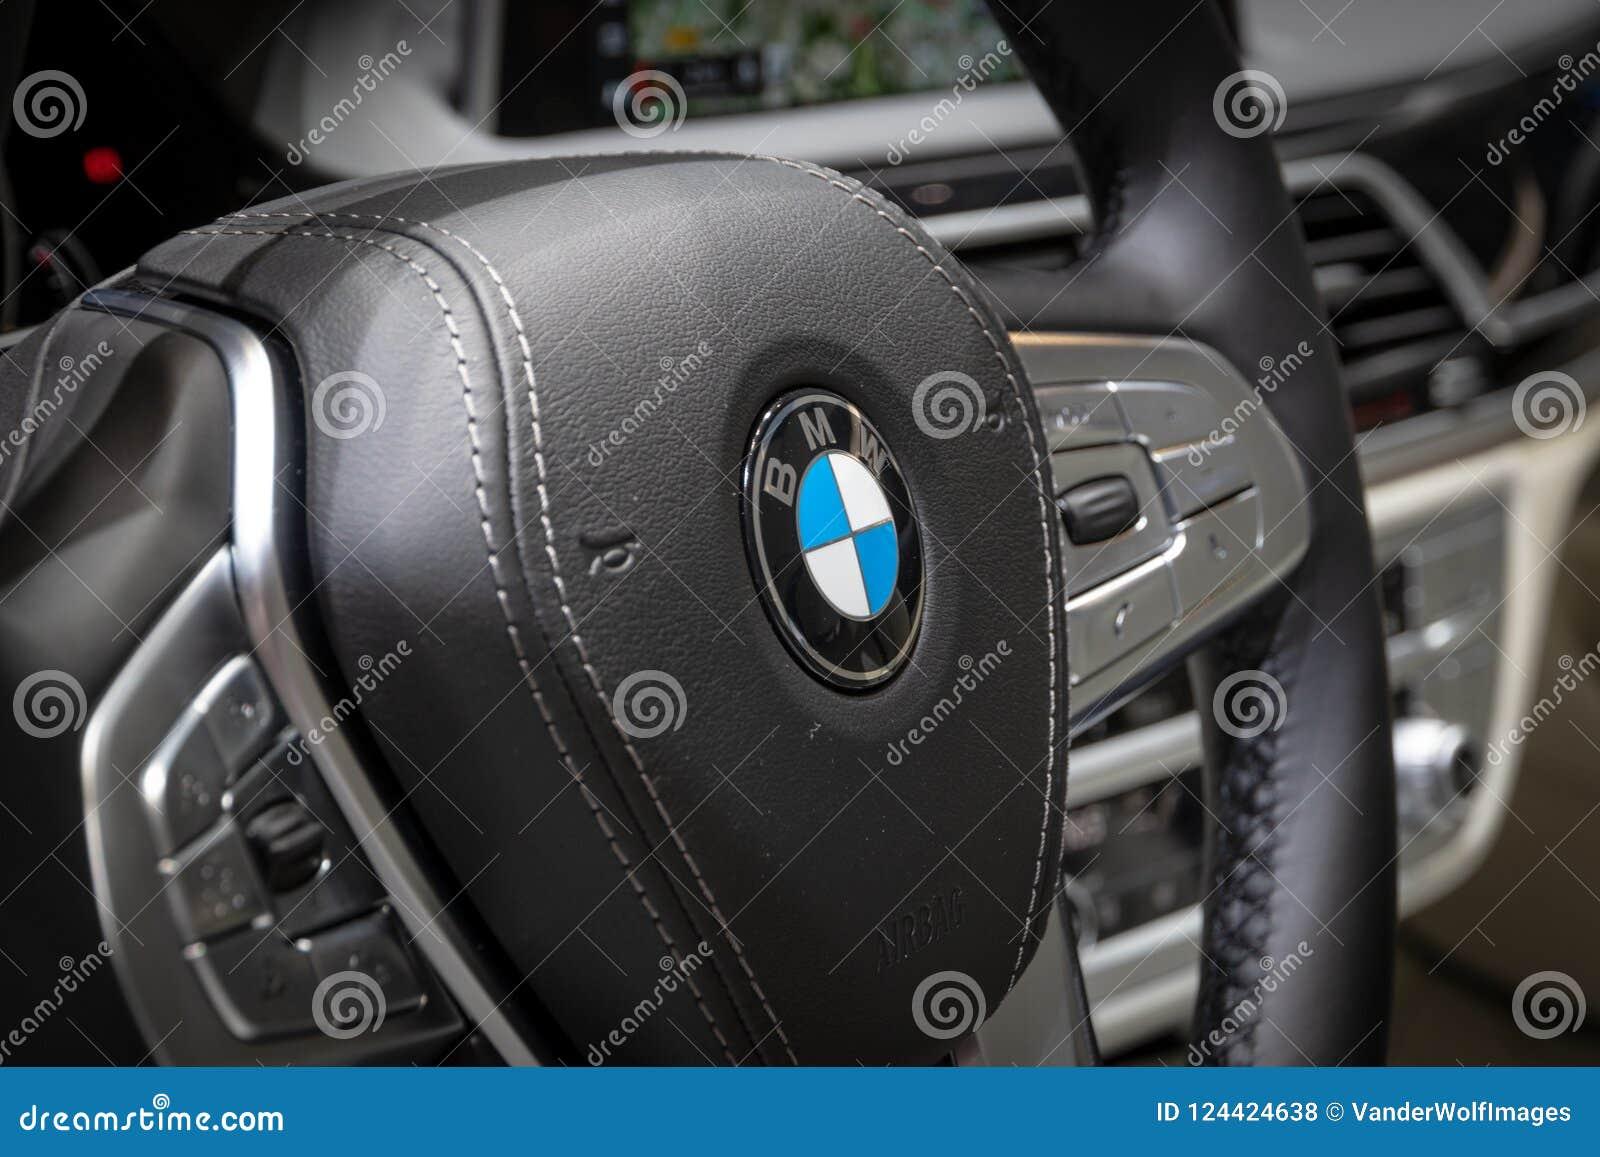 BMW 7-series Car Steering Wheel Editorial Stock Photo ... - photo#26